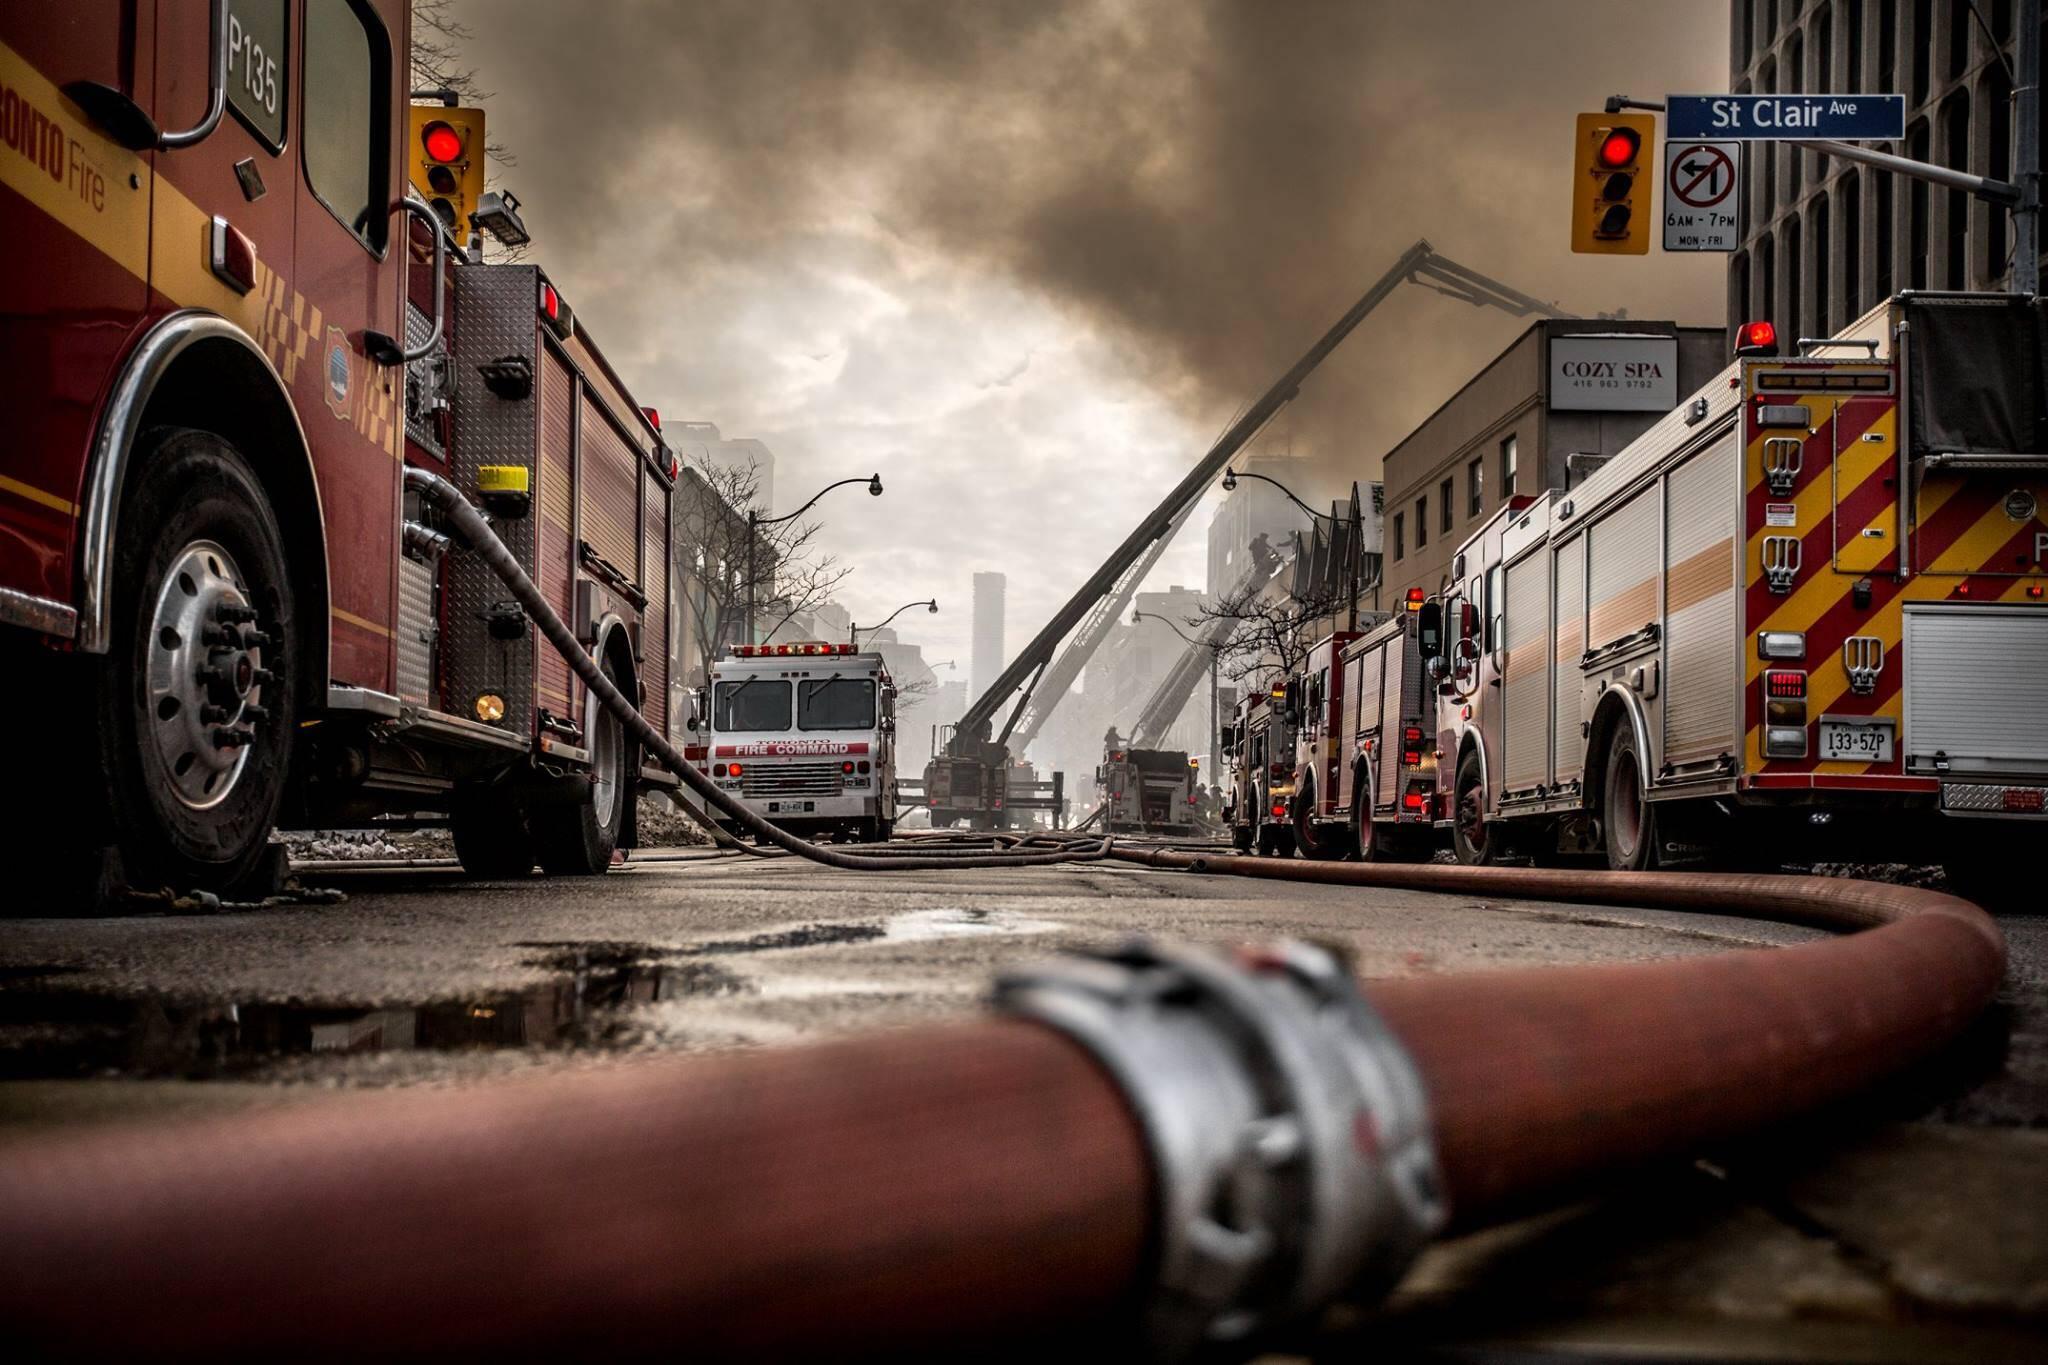 toronto fire photos